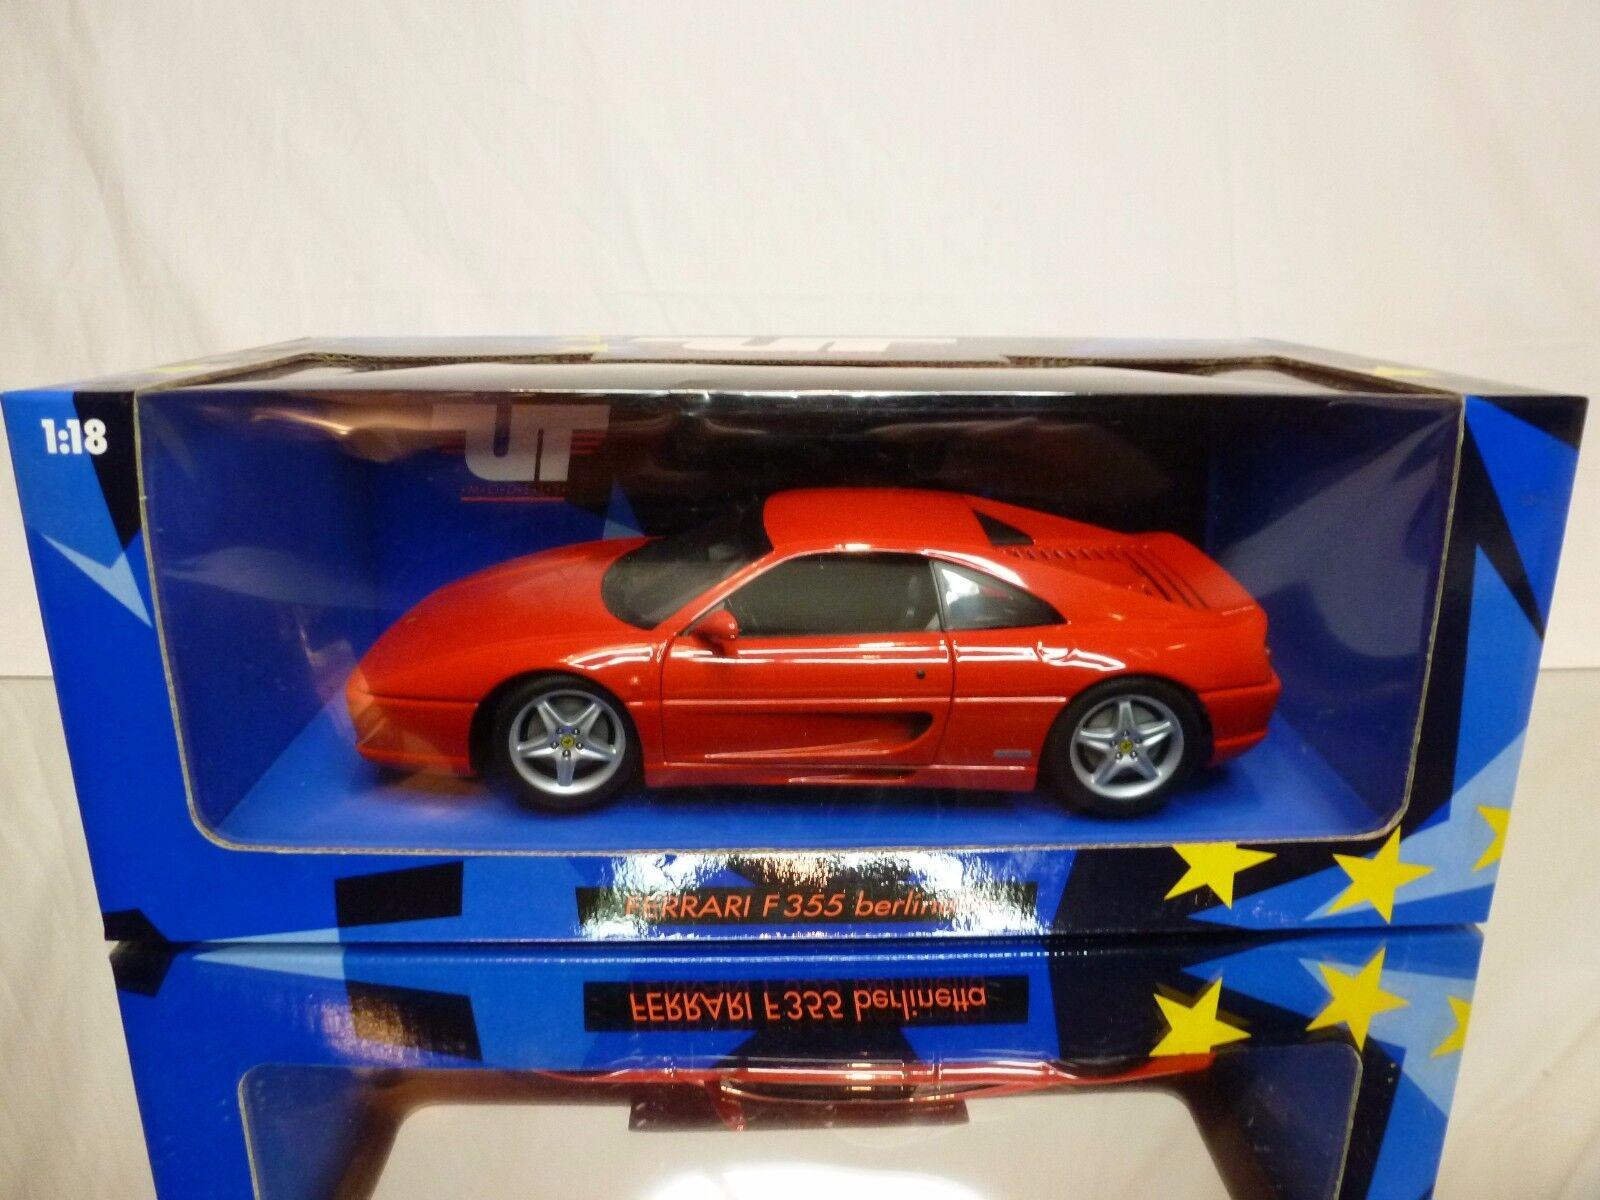 UT MODELS 74020 FERRARI F355 BERLINETTA - RED RED RED 1 18 - EXCELLENT CONDITION IN BOX 51fce4